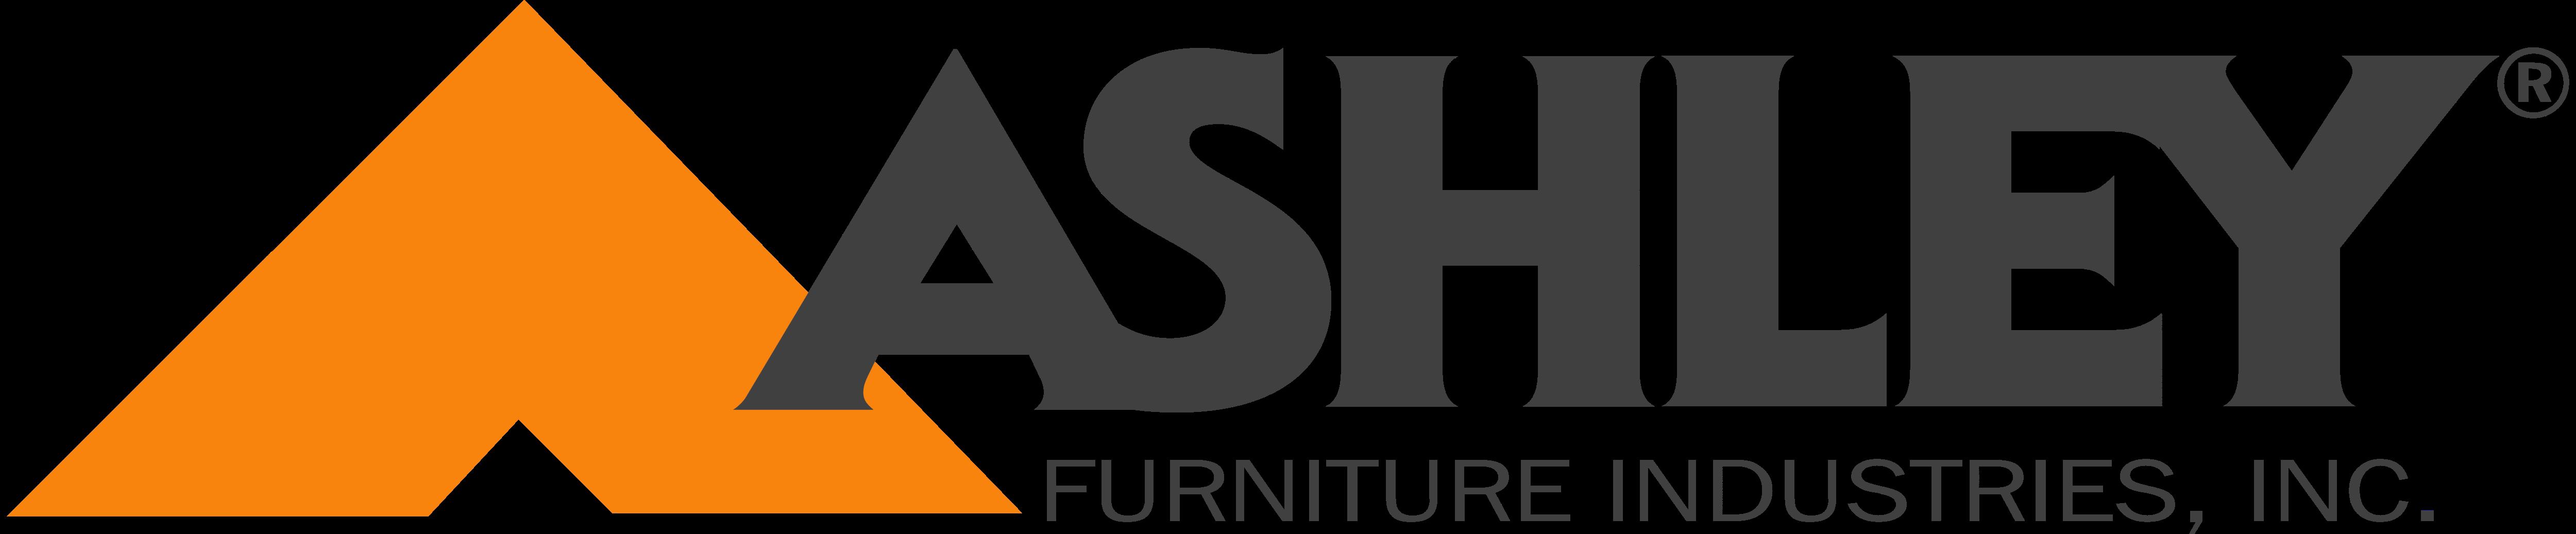 Logo Ashley Furniture Png - Ashley Furniture Logo, Logotype   Ashley Furniture Homestore Logo Vector Png, Transparent background PNG HD thumbnail